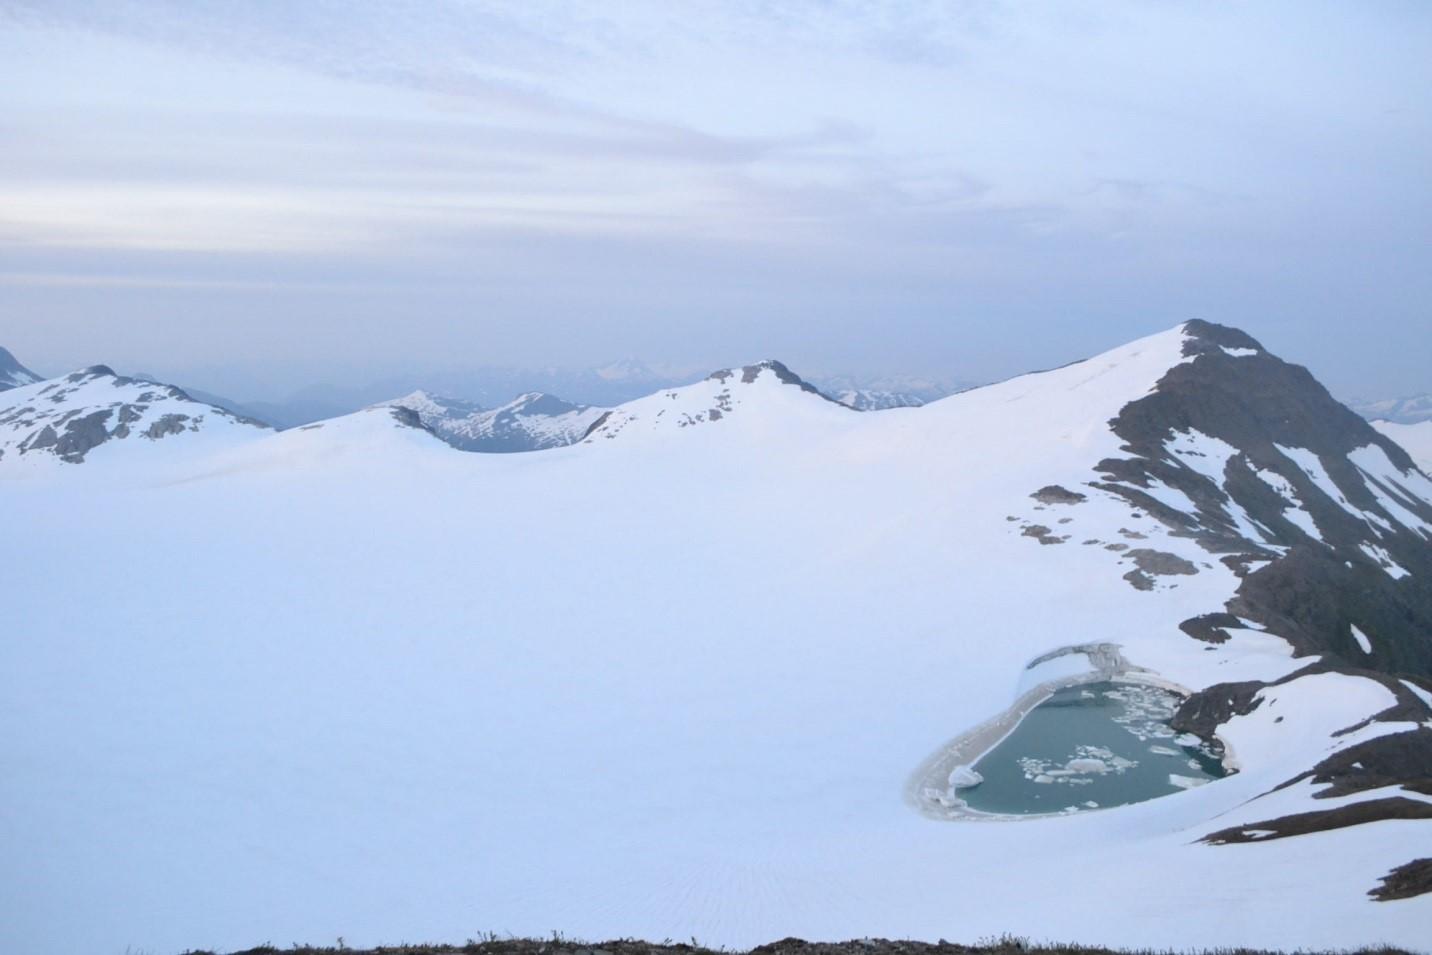 Lake Linda on the Lemon Creek glacier, mid-drainage. Photo by Joel Wilner.